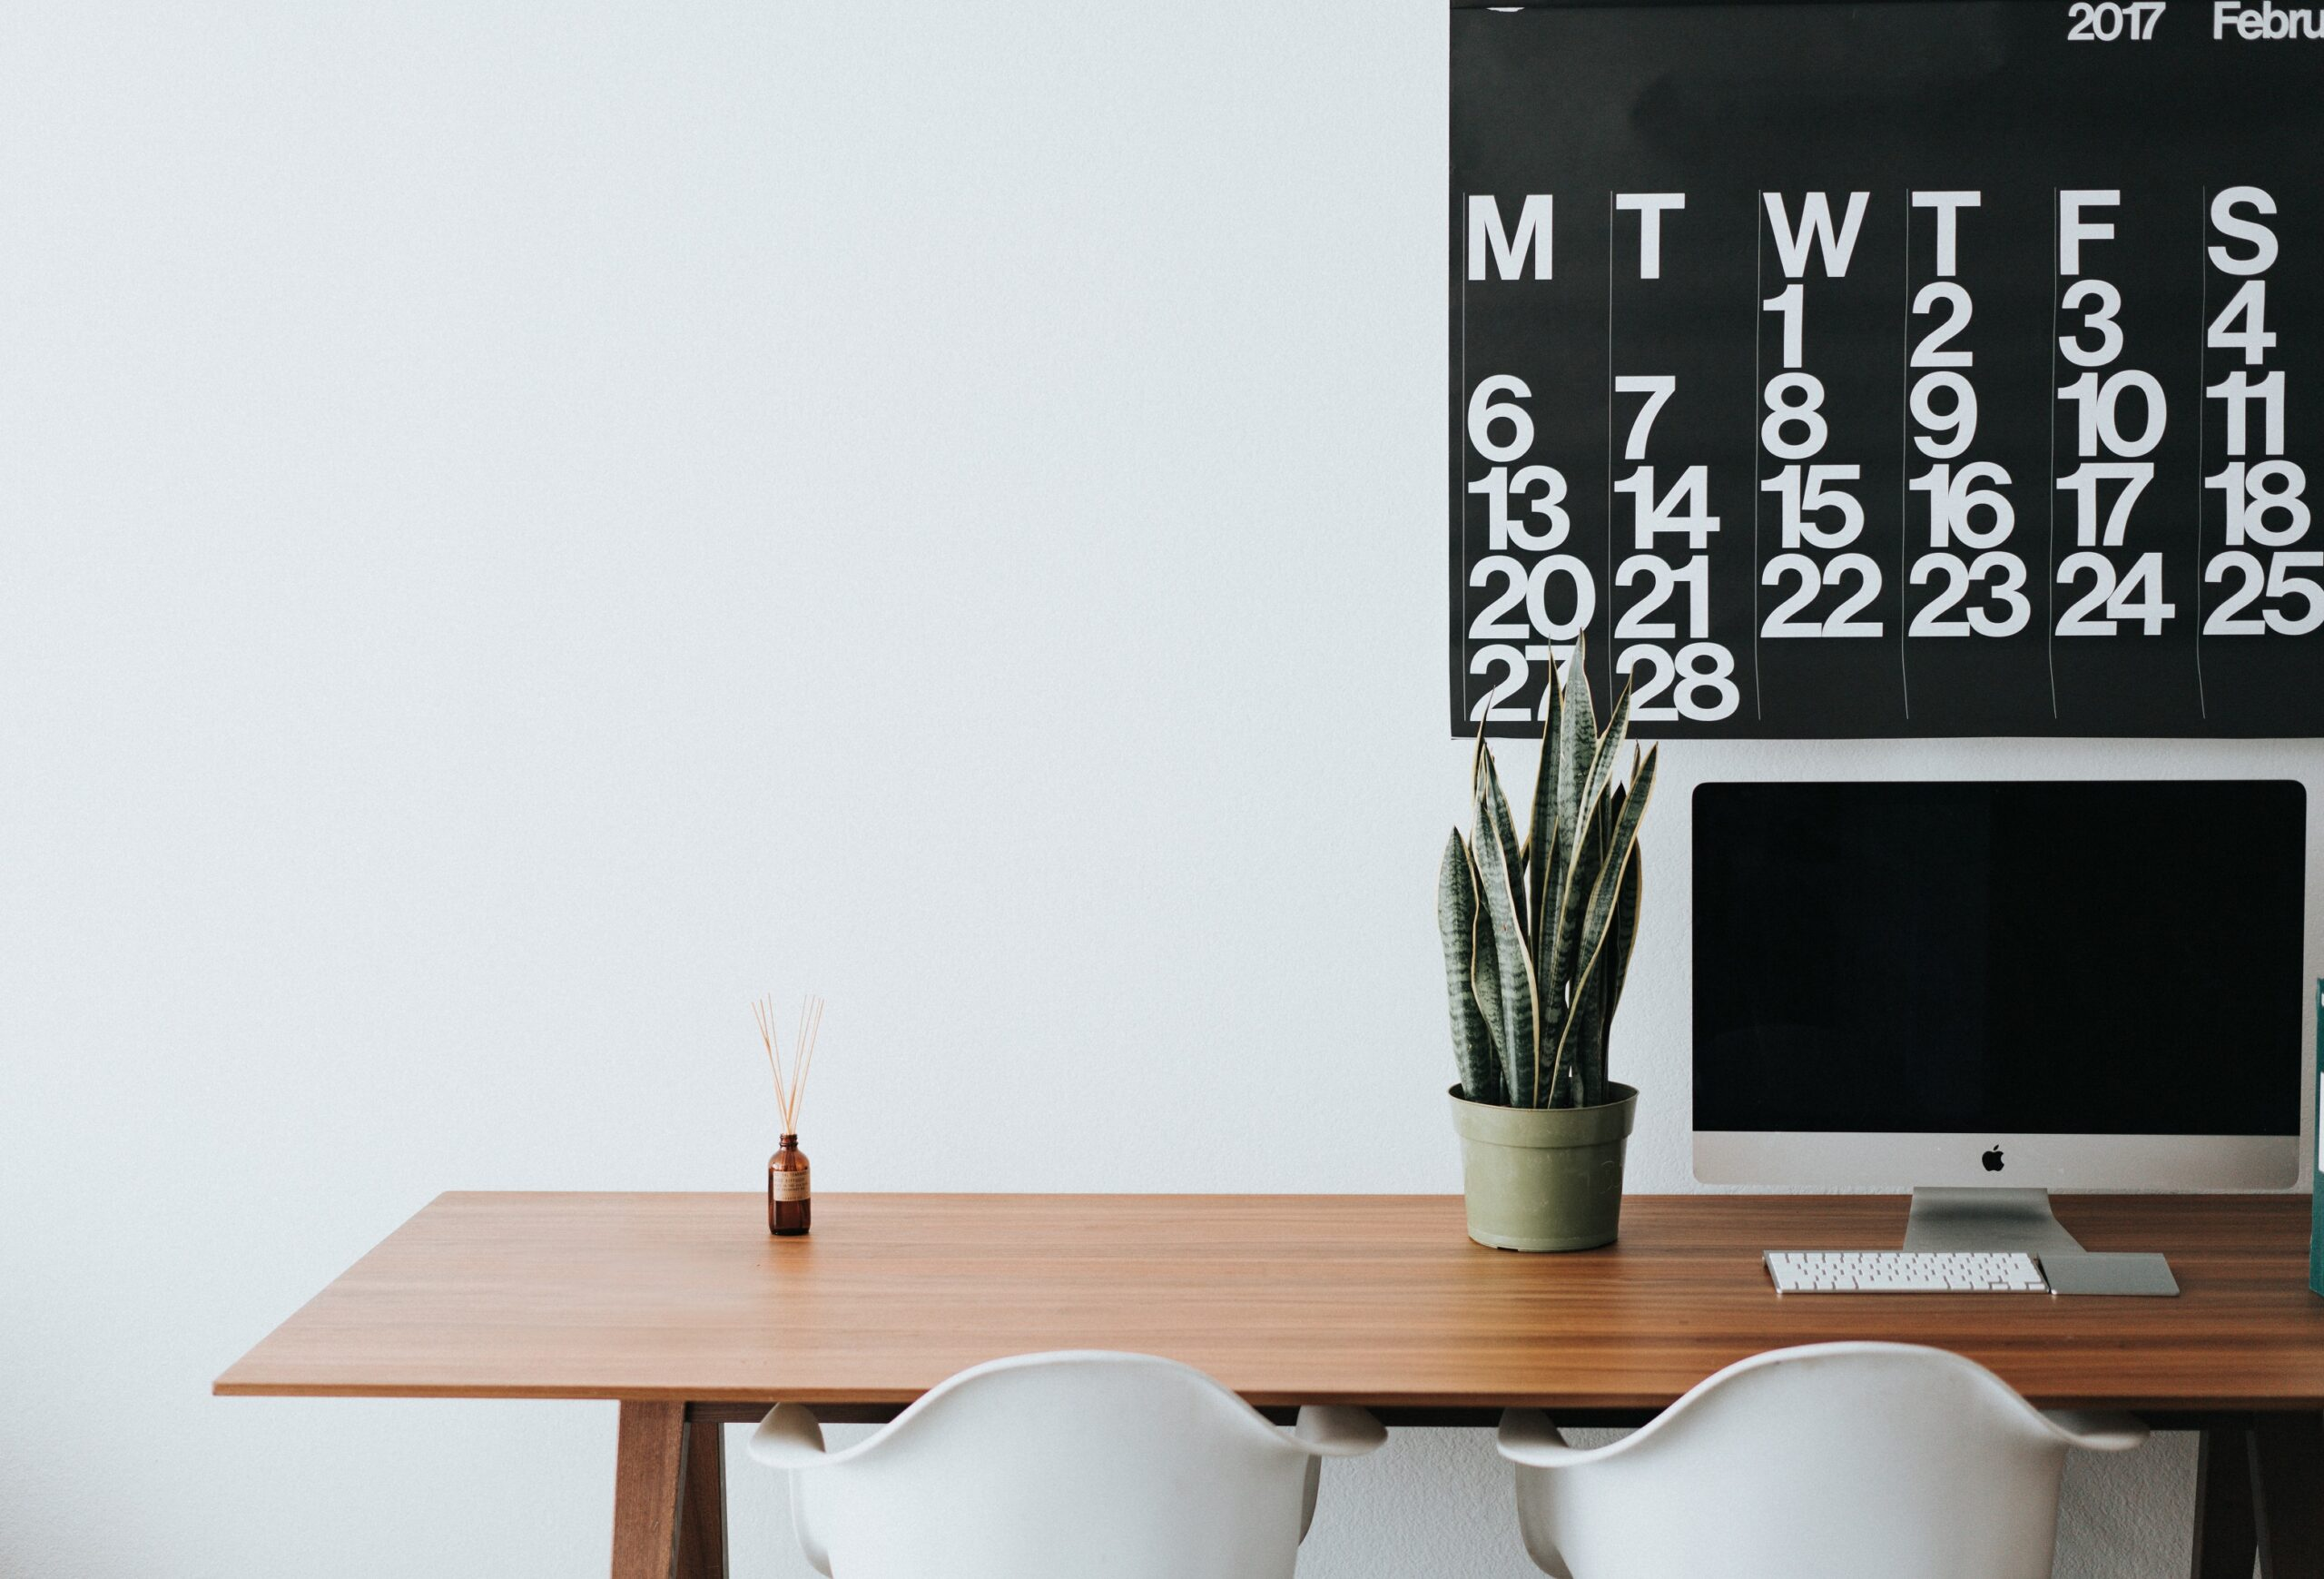 Desk and Wall Calendar